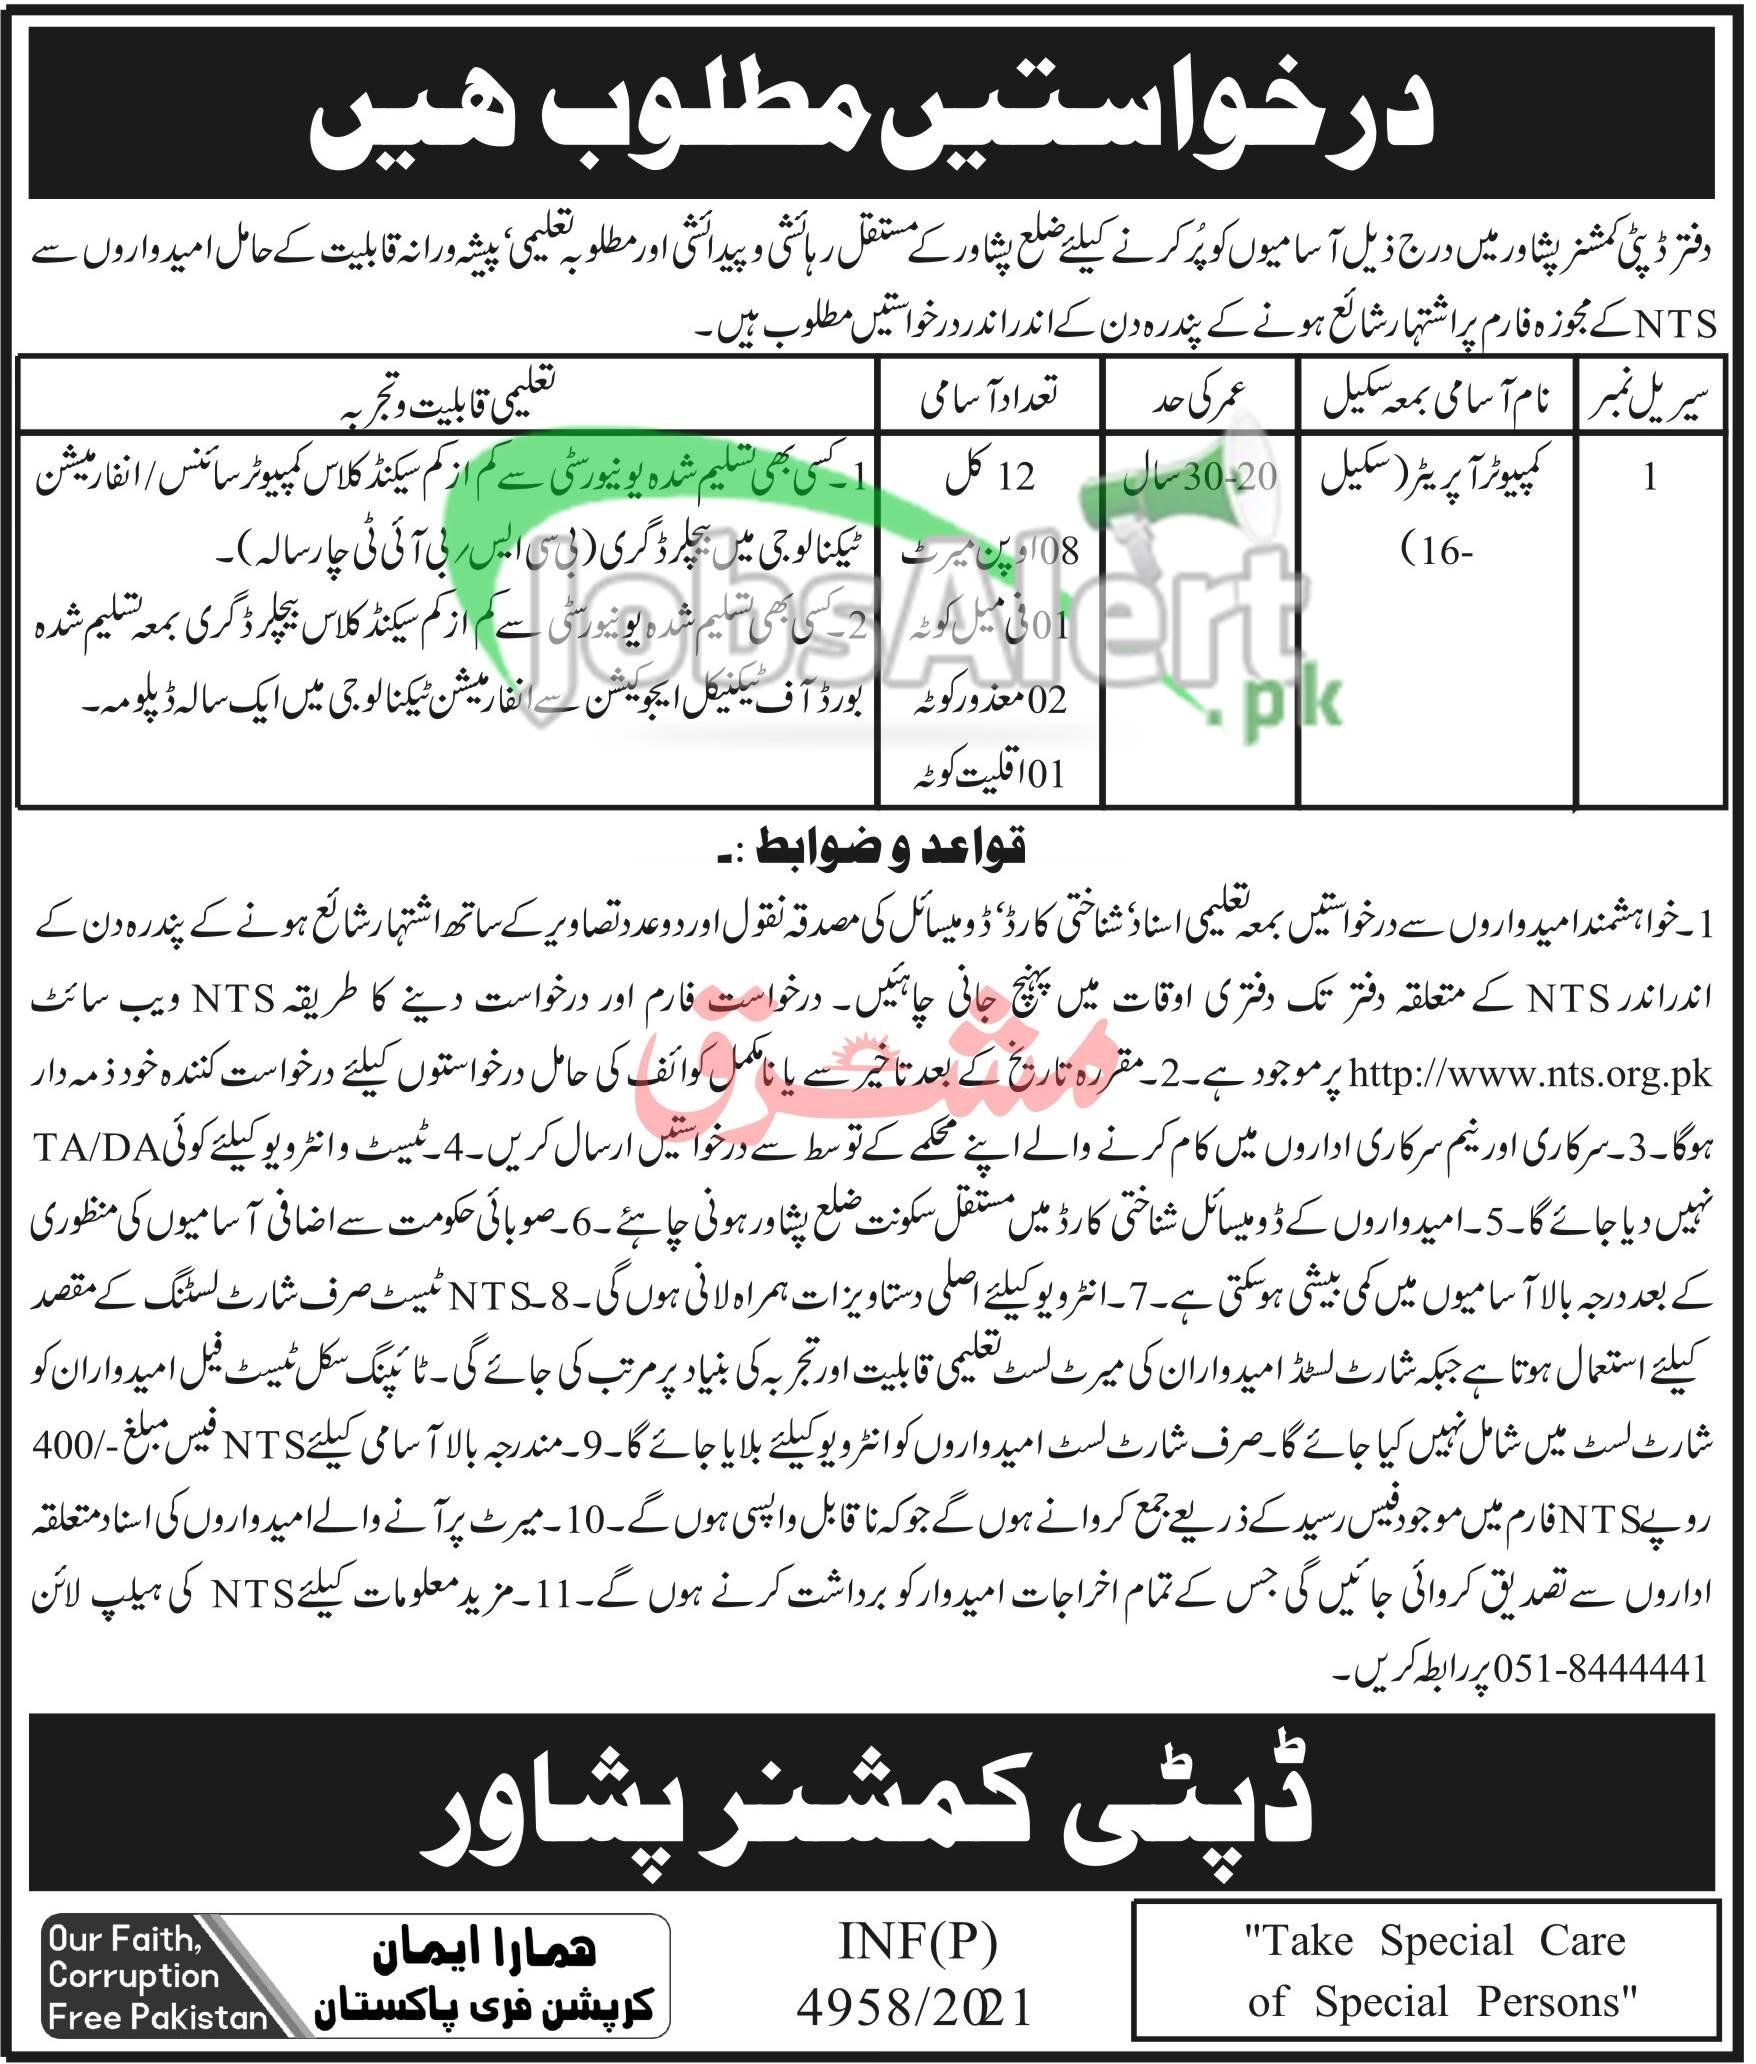 Deputy Commissioner Office Peshawar Jobs